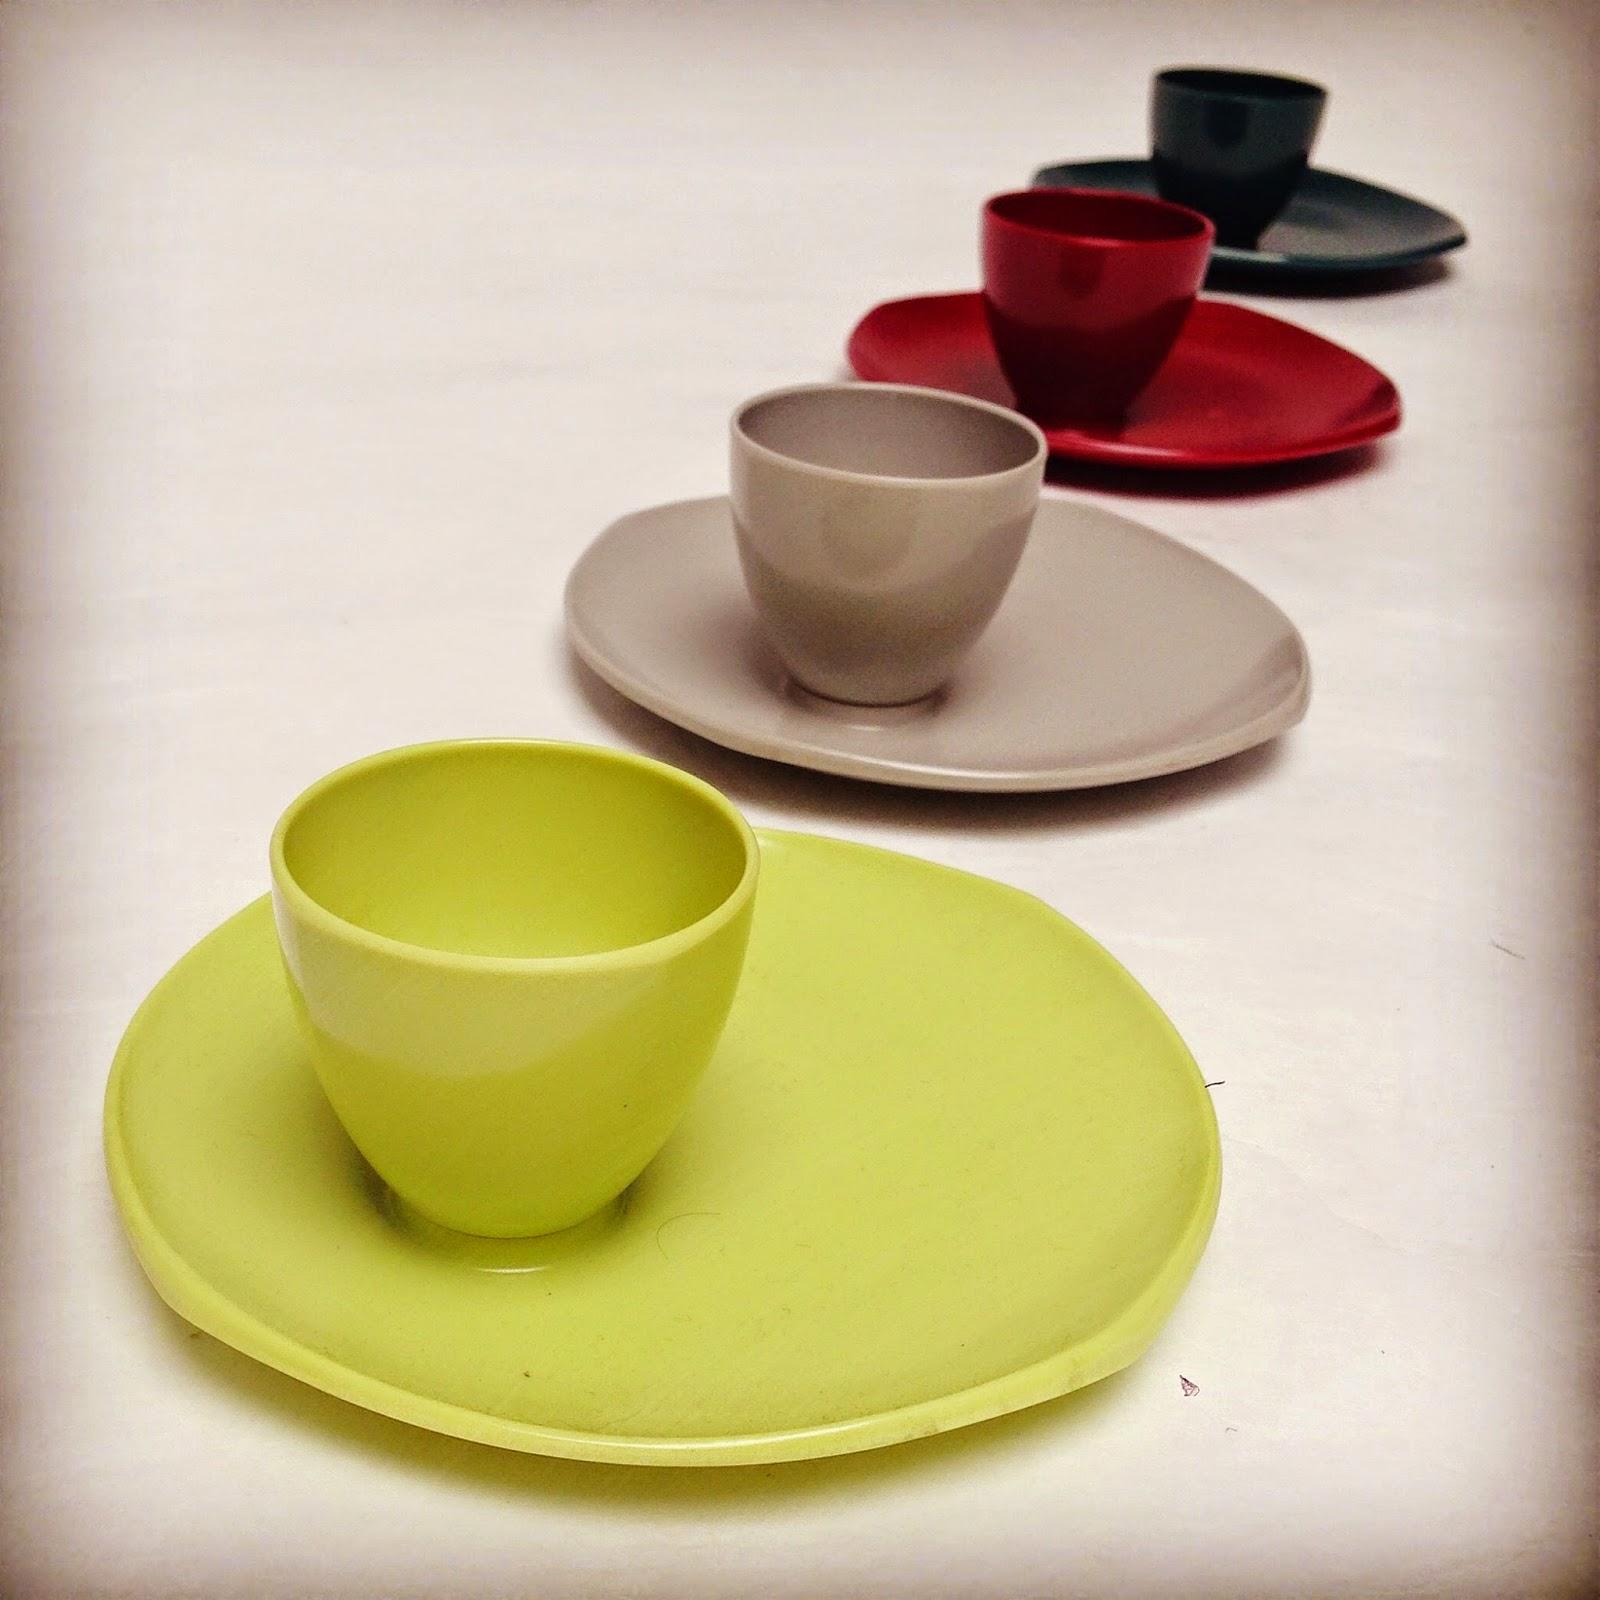 Industrial design in victoria australia designed in for Product design melbourne